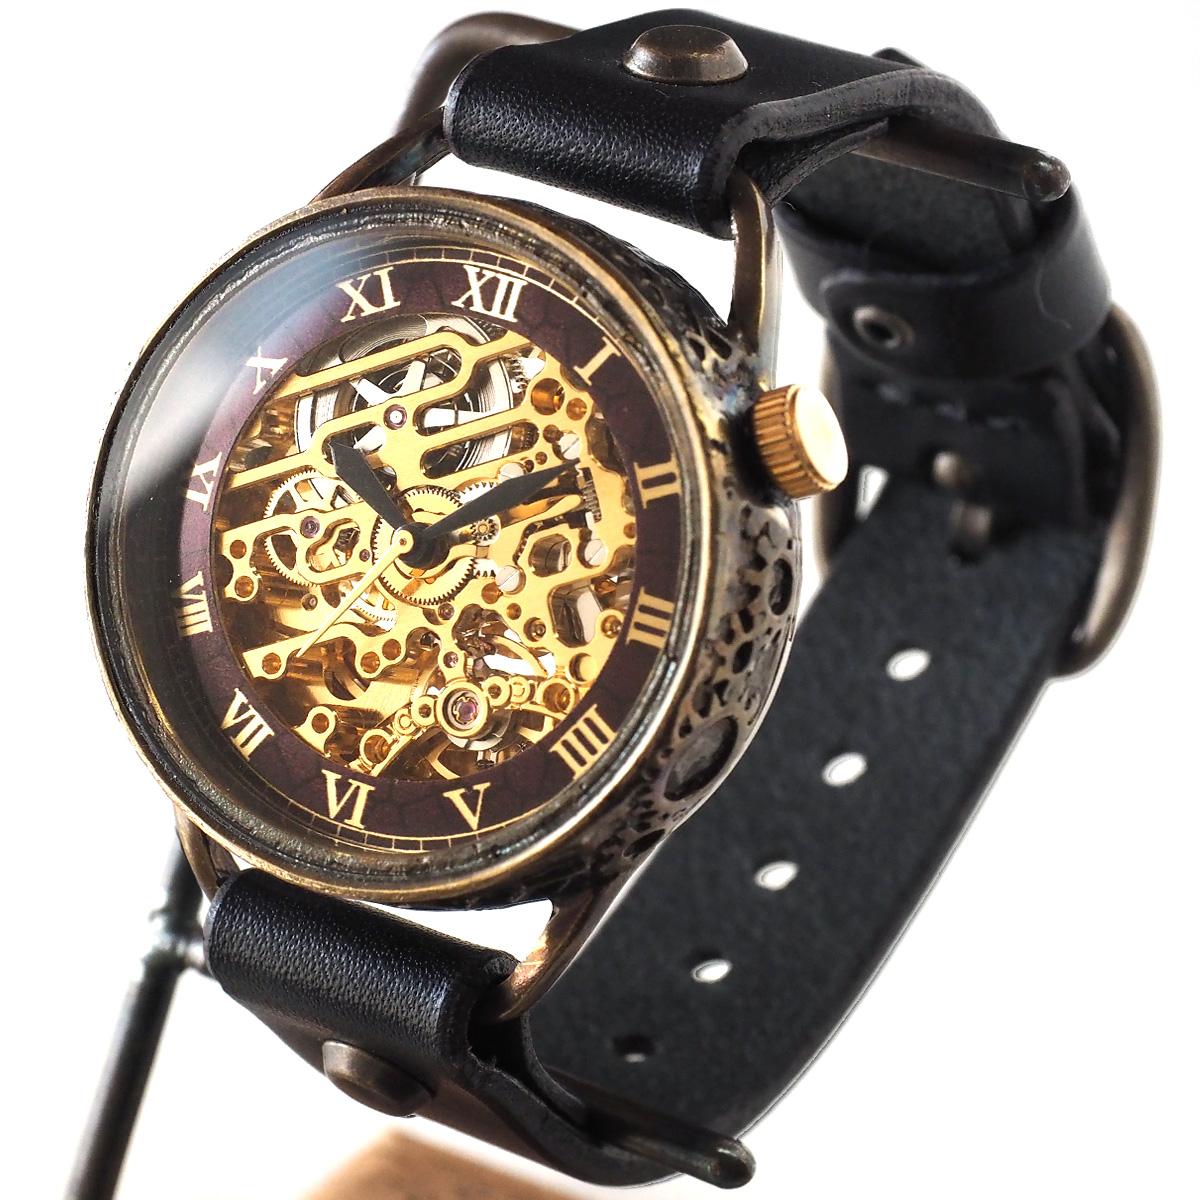 KINO(キノ) 手作り腕時計 自動巻き 裏スケルトン メカニックゴールド ブラック [K-15-MGD-BK]